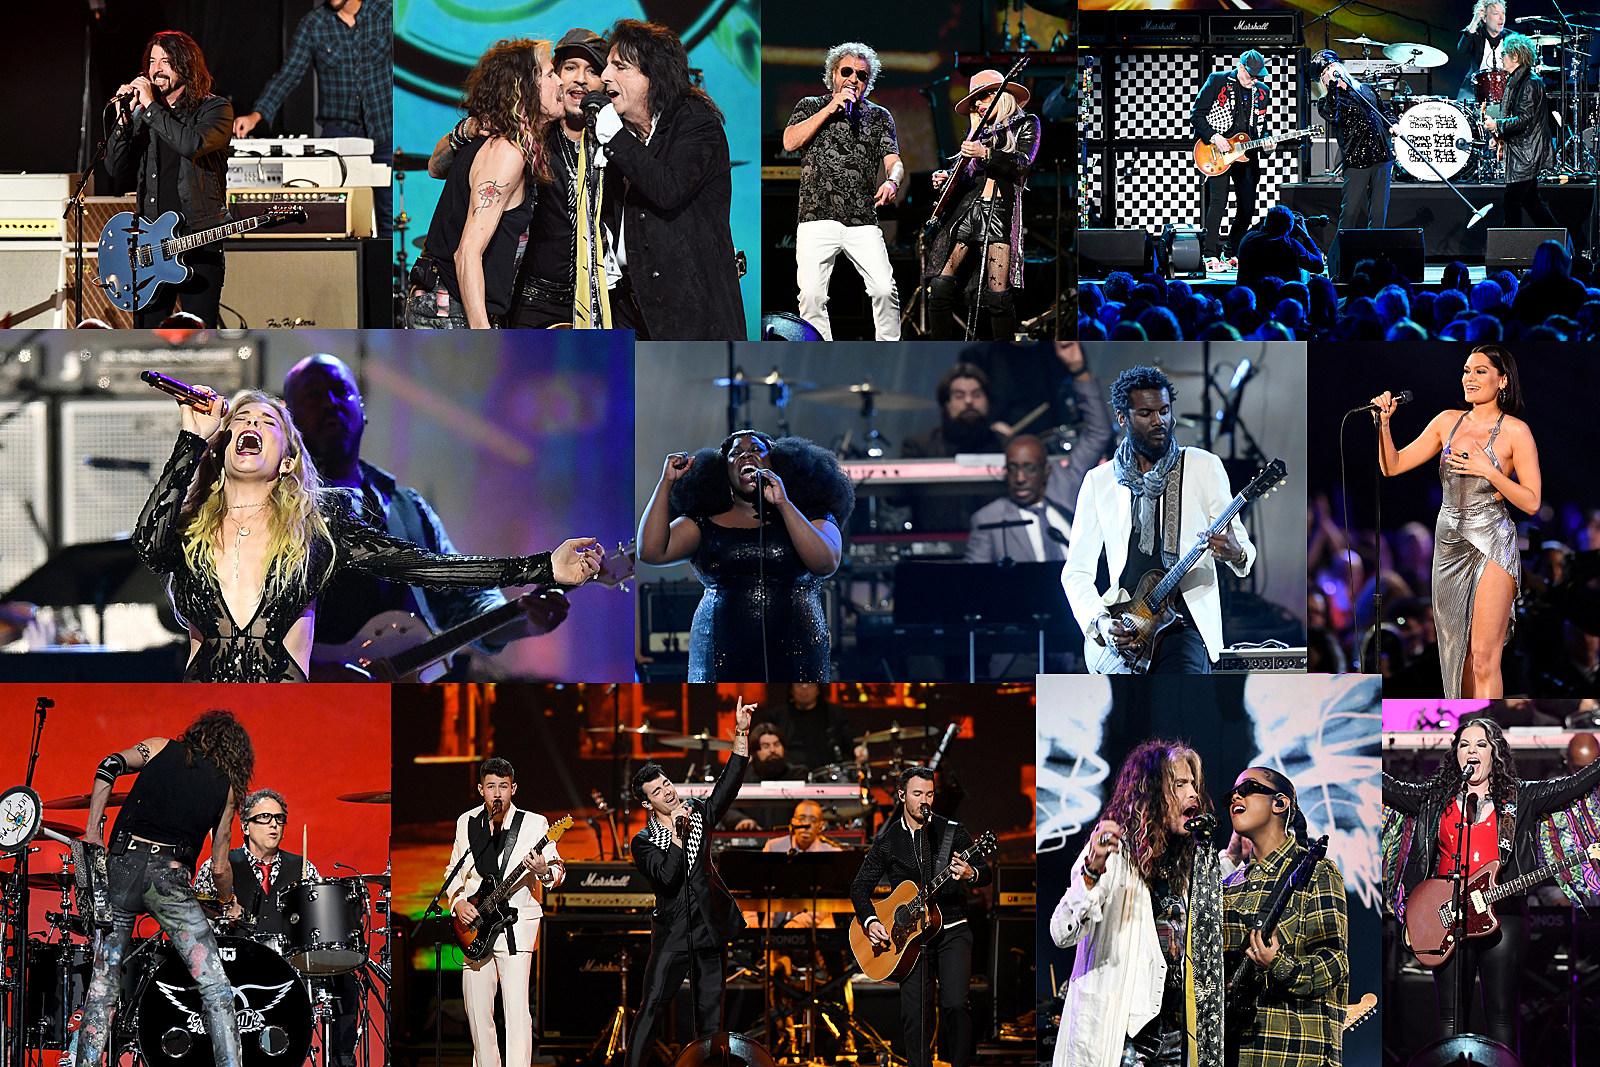 Watch Sammy Hagar, Alice Cooper Play Aerosmith Songs at MusiCares